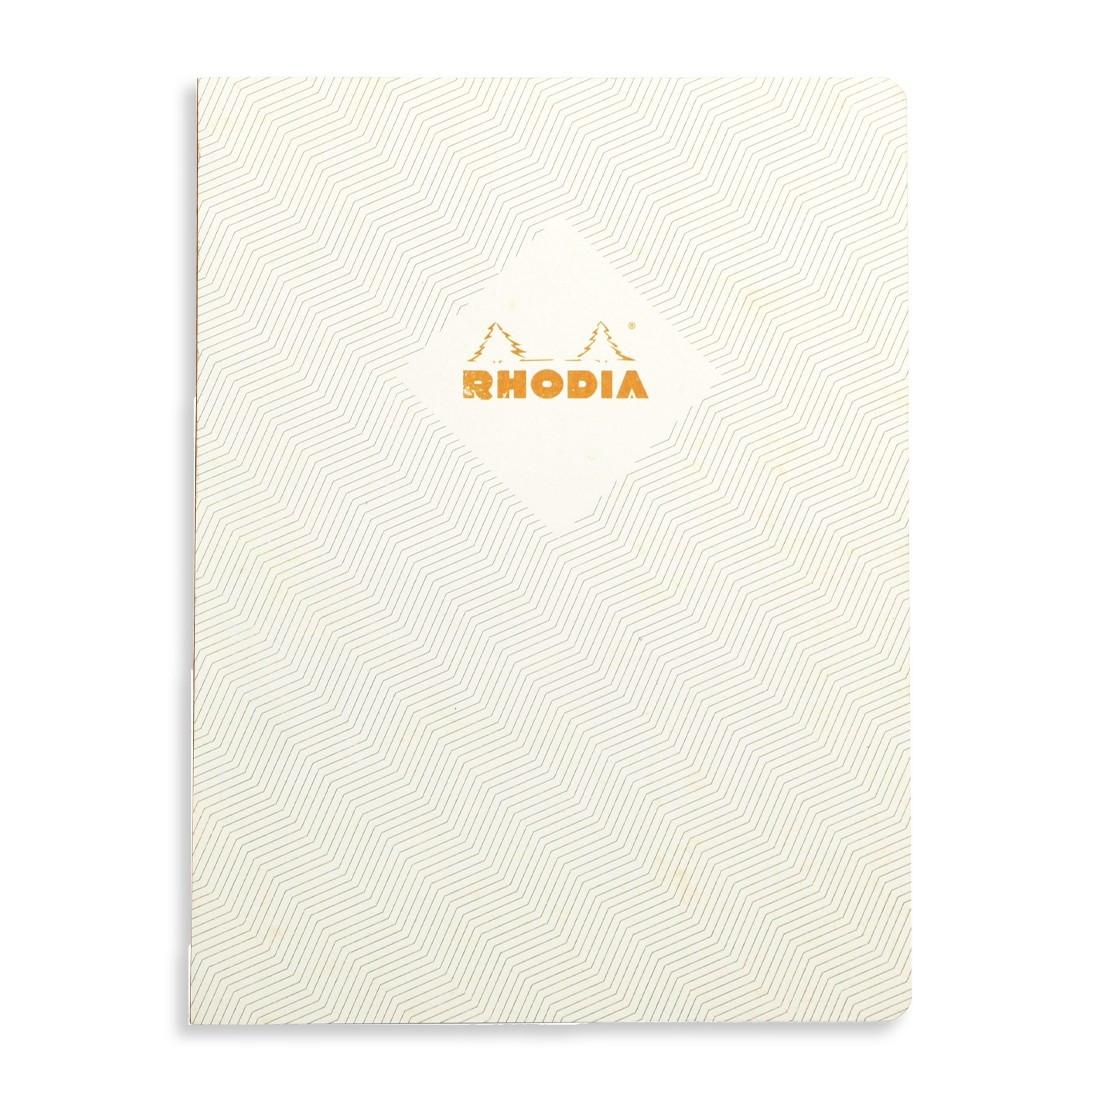 Rhodia Heritage Notebook - Ivory Chevrons